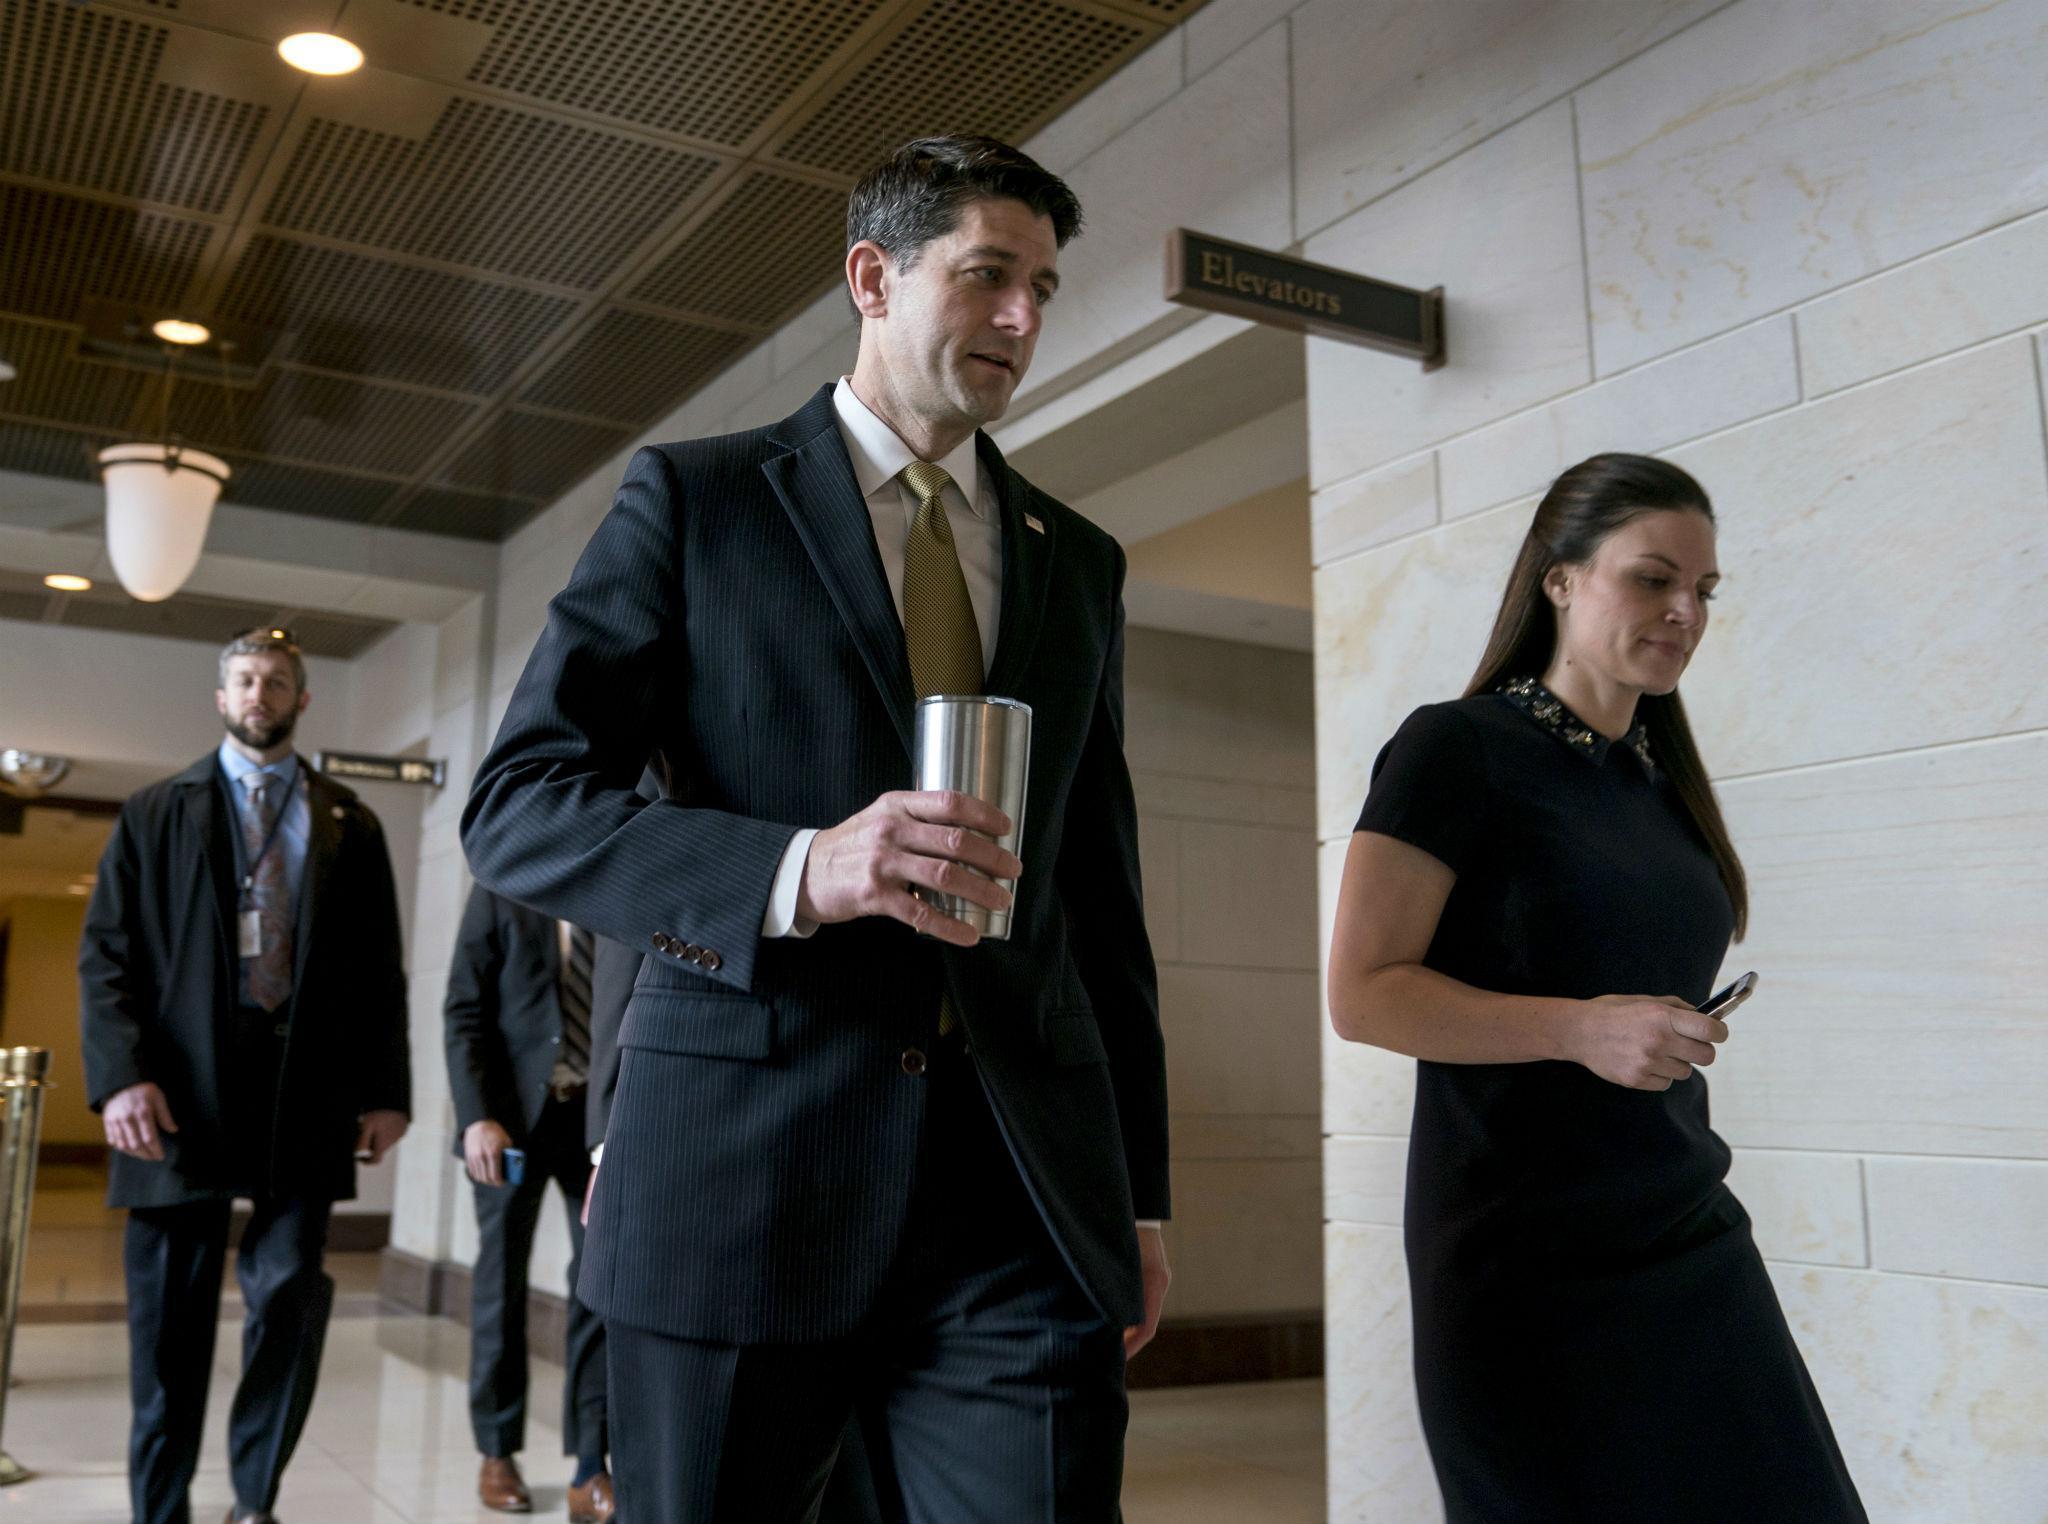 House passes short-term spending bill to avoid government shutdown but greater problems await in the Senate